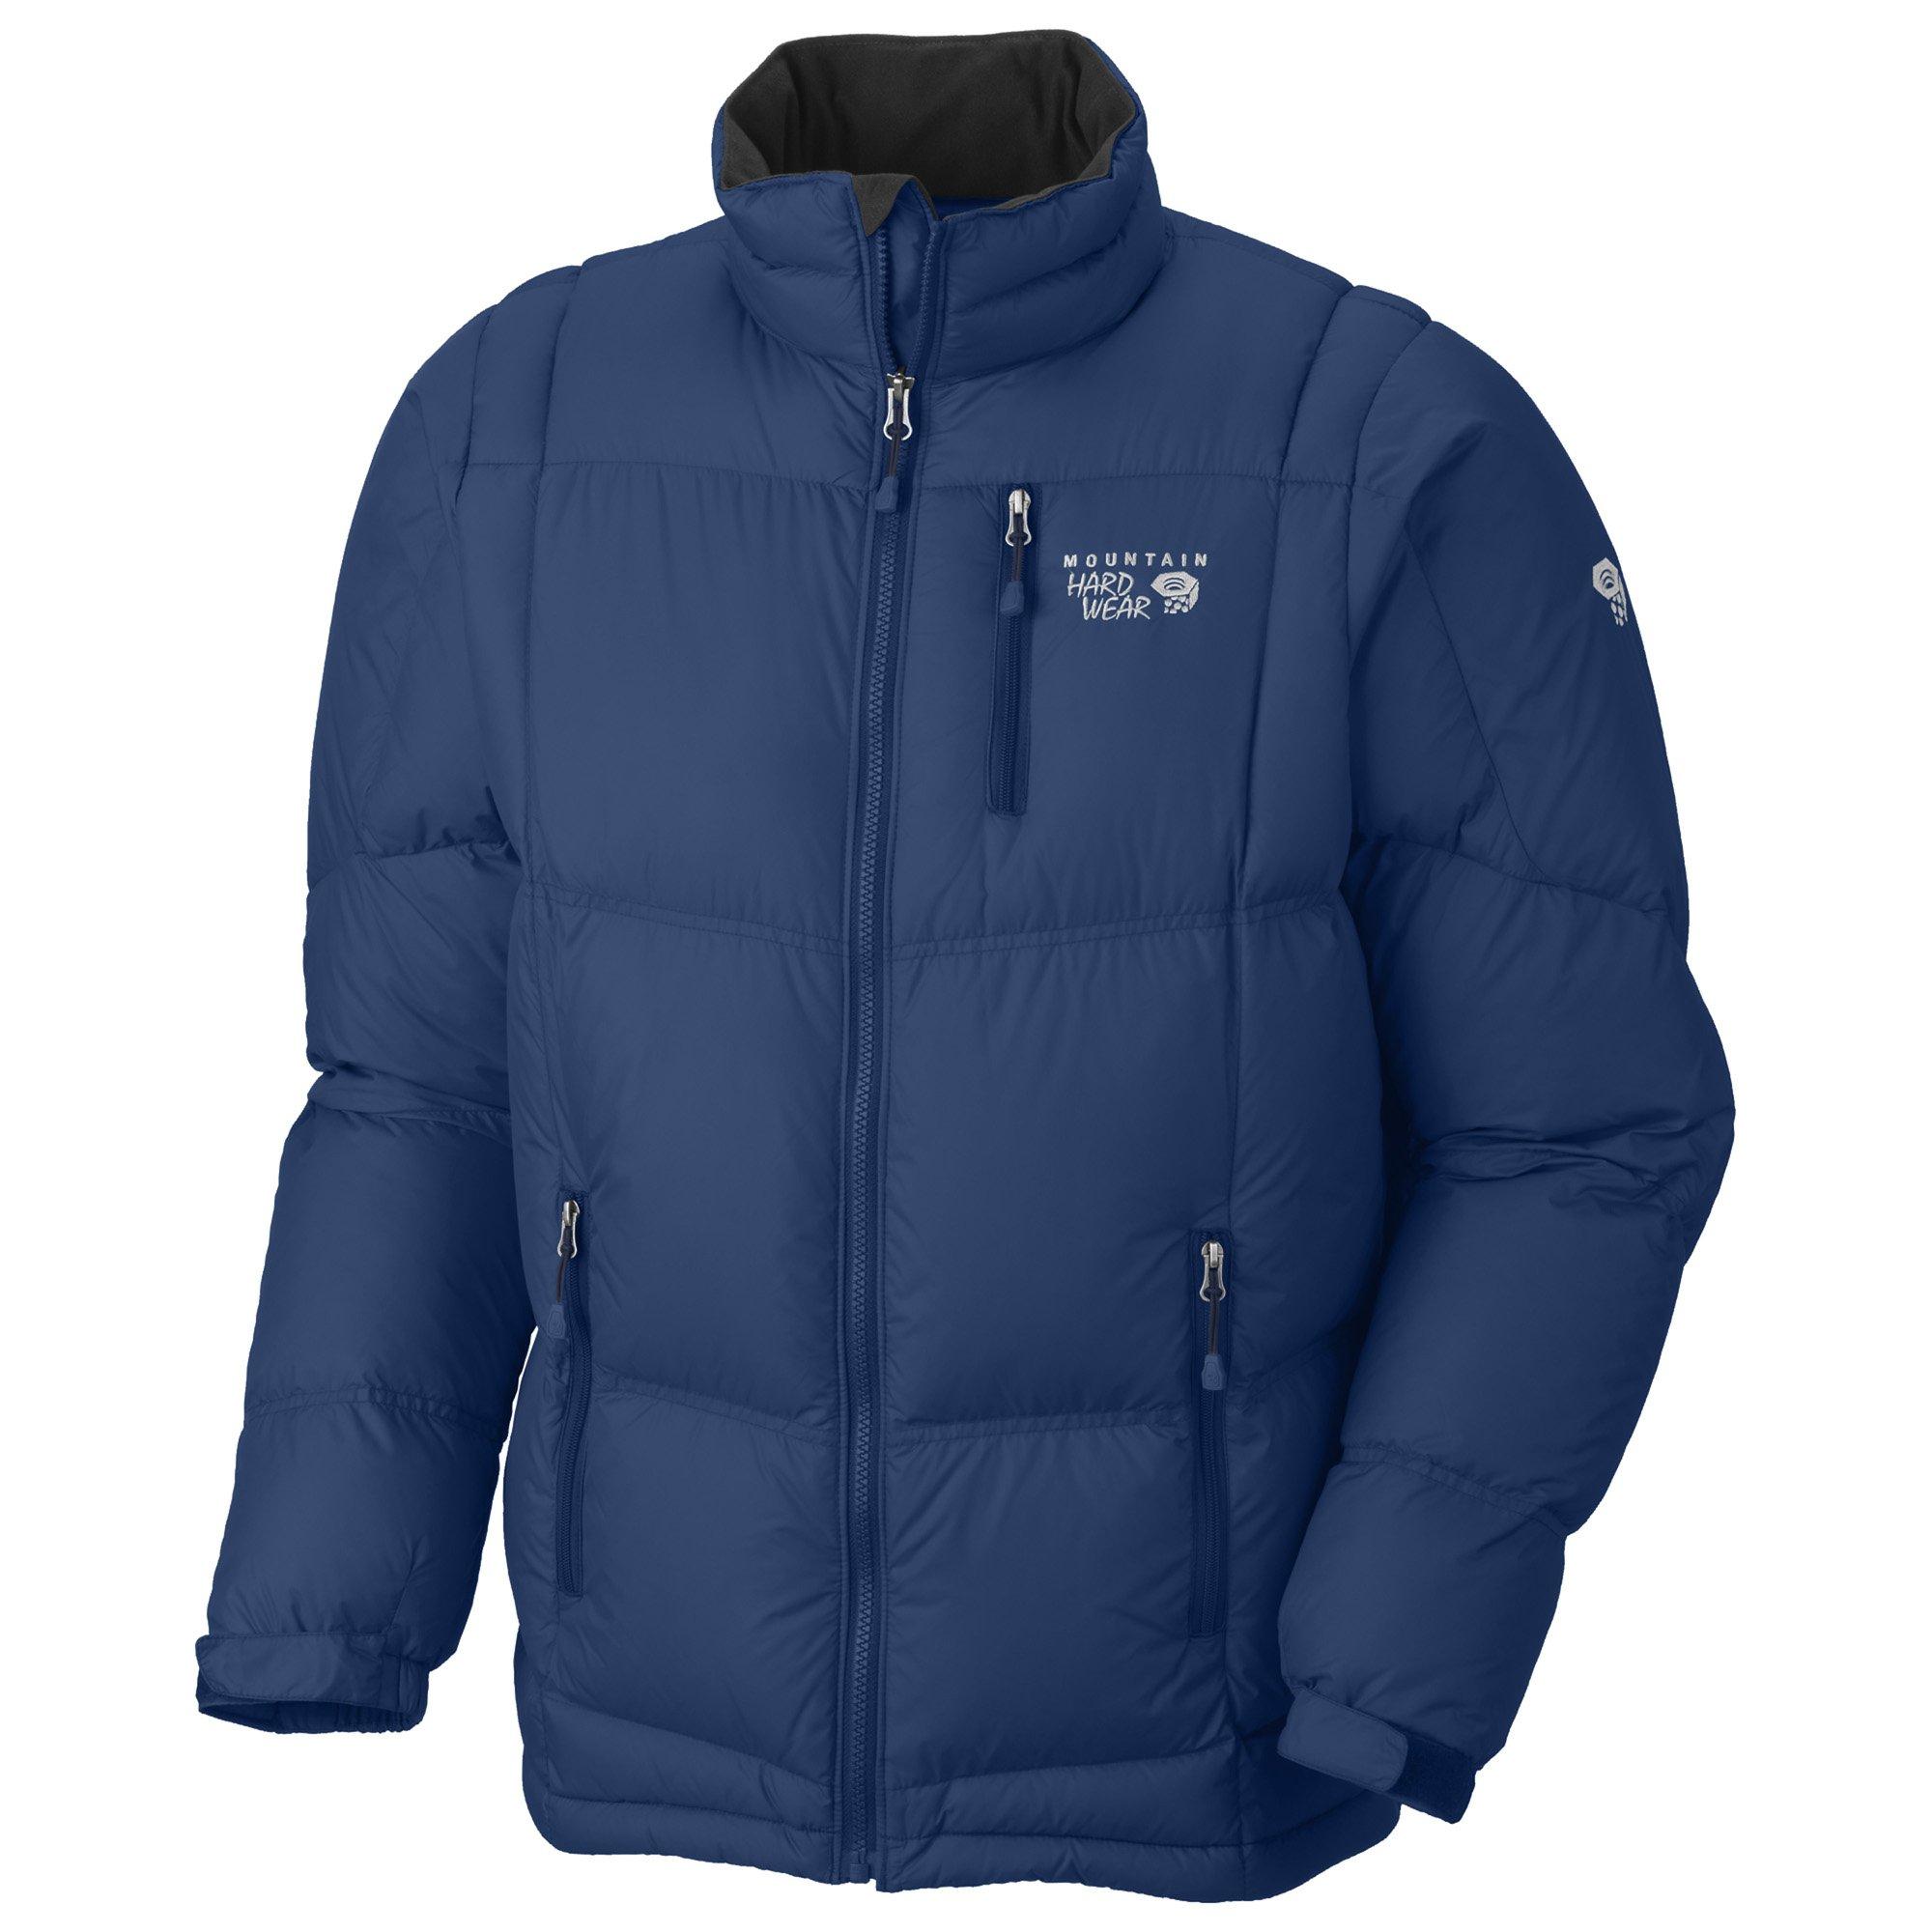 Mountain Hardwear Lodown Jacket Royal Mens Sz M by Mountain Hardwear